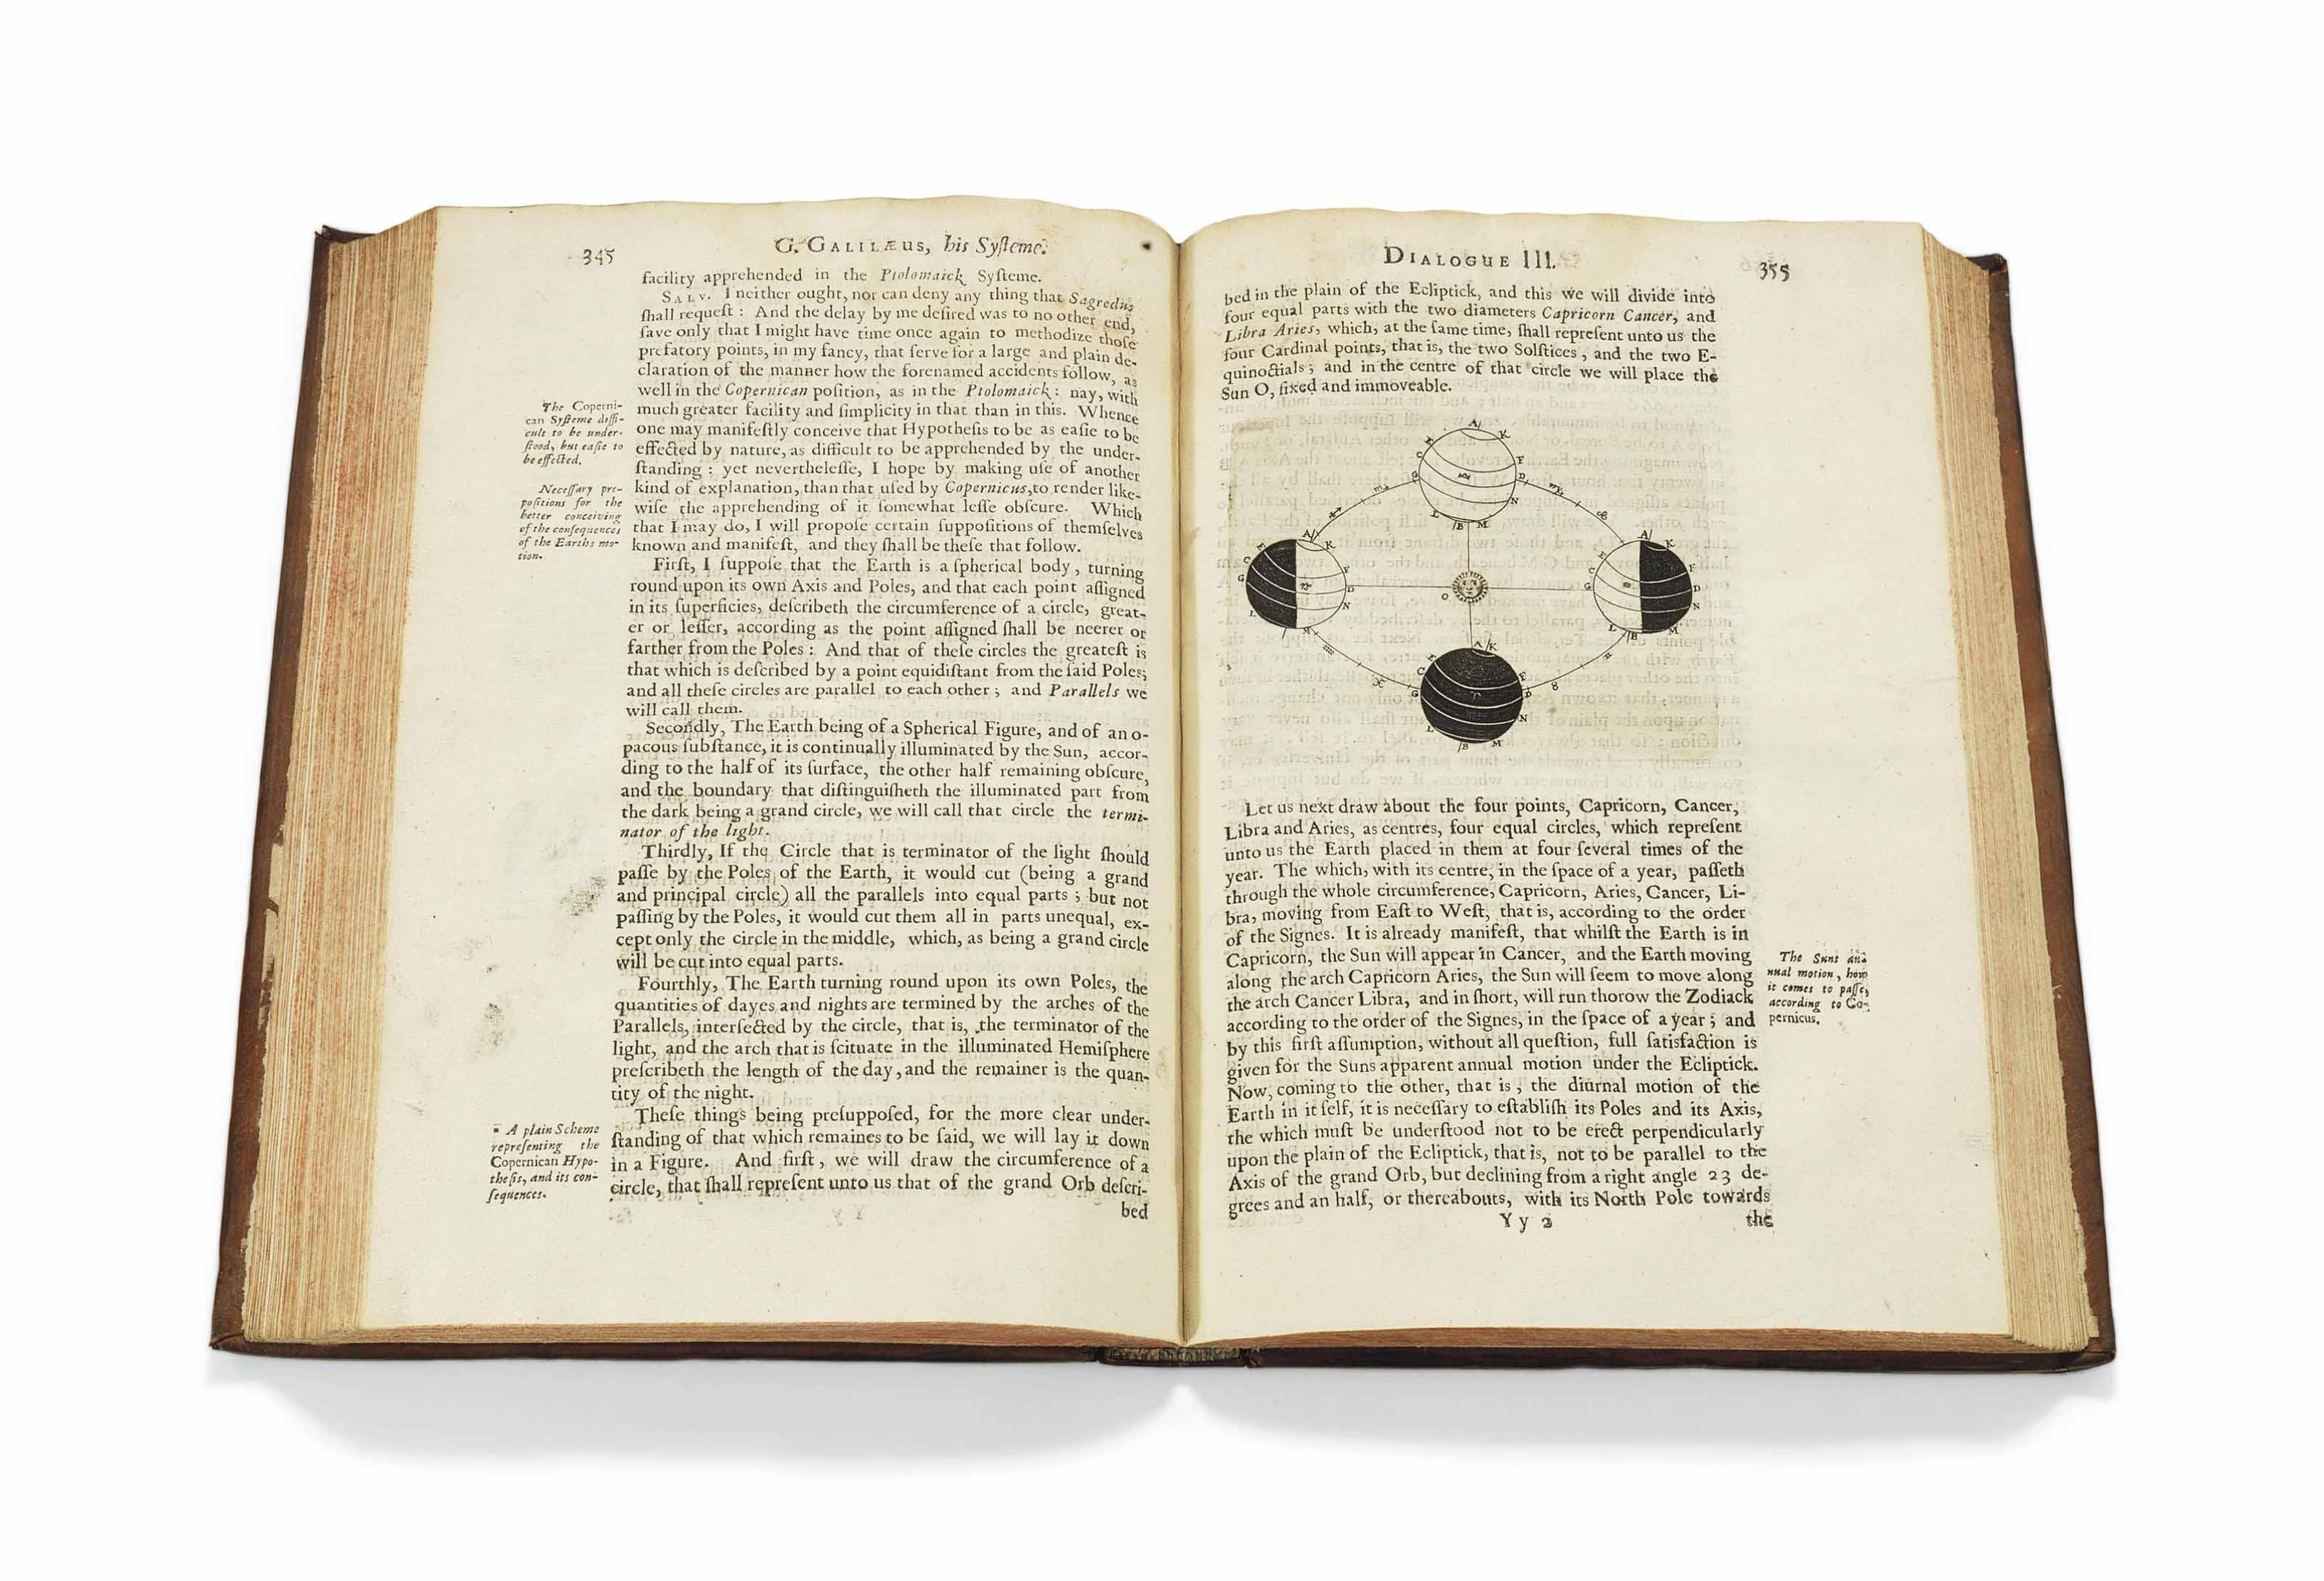 GALILEI, Galileo (1564-1642) a